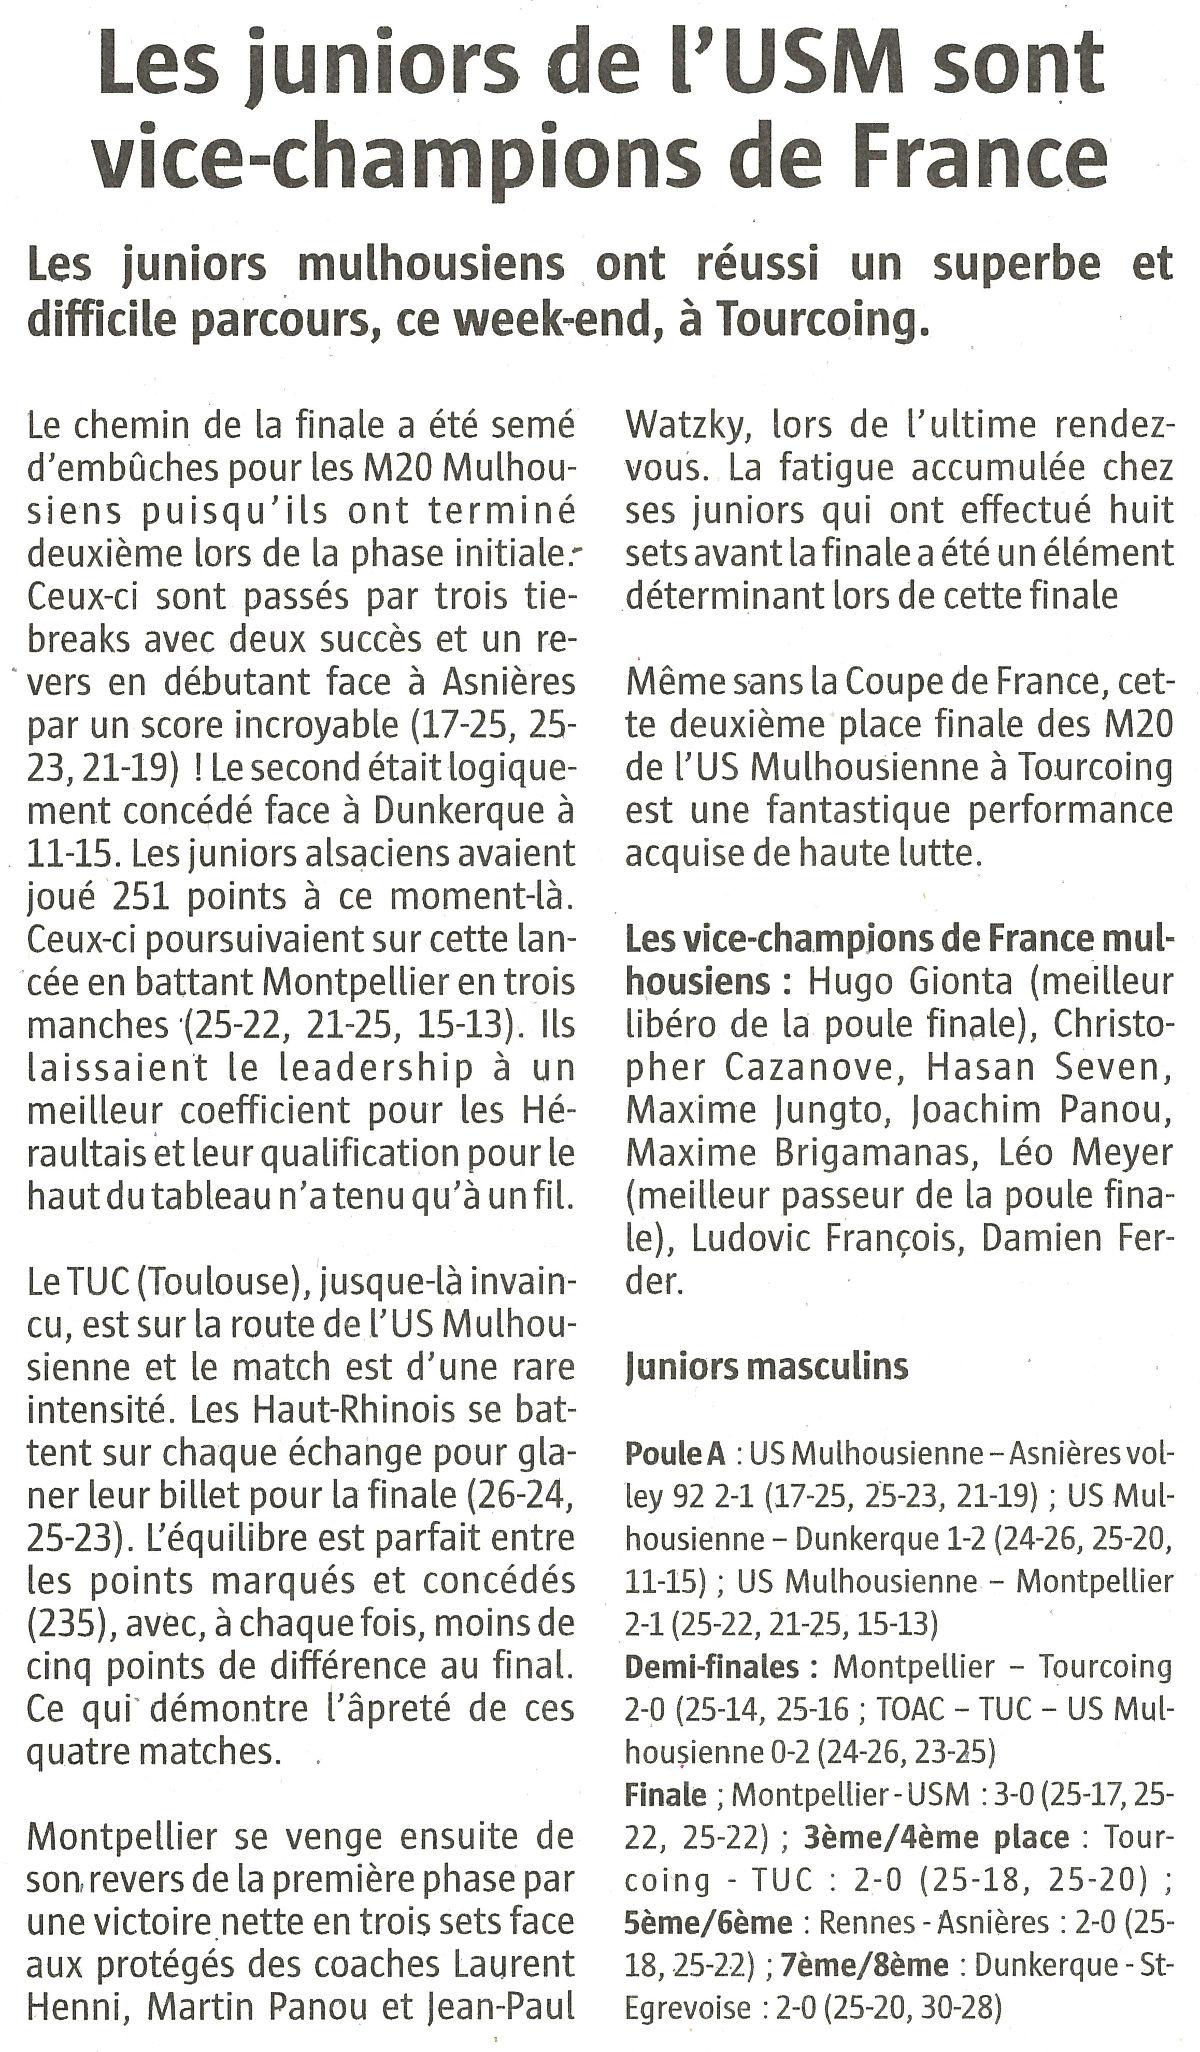 Les juniors de l'USM sont vice-champions de France